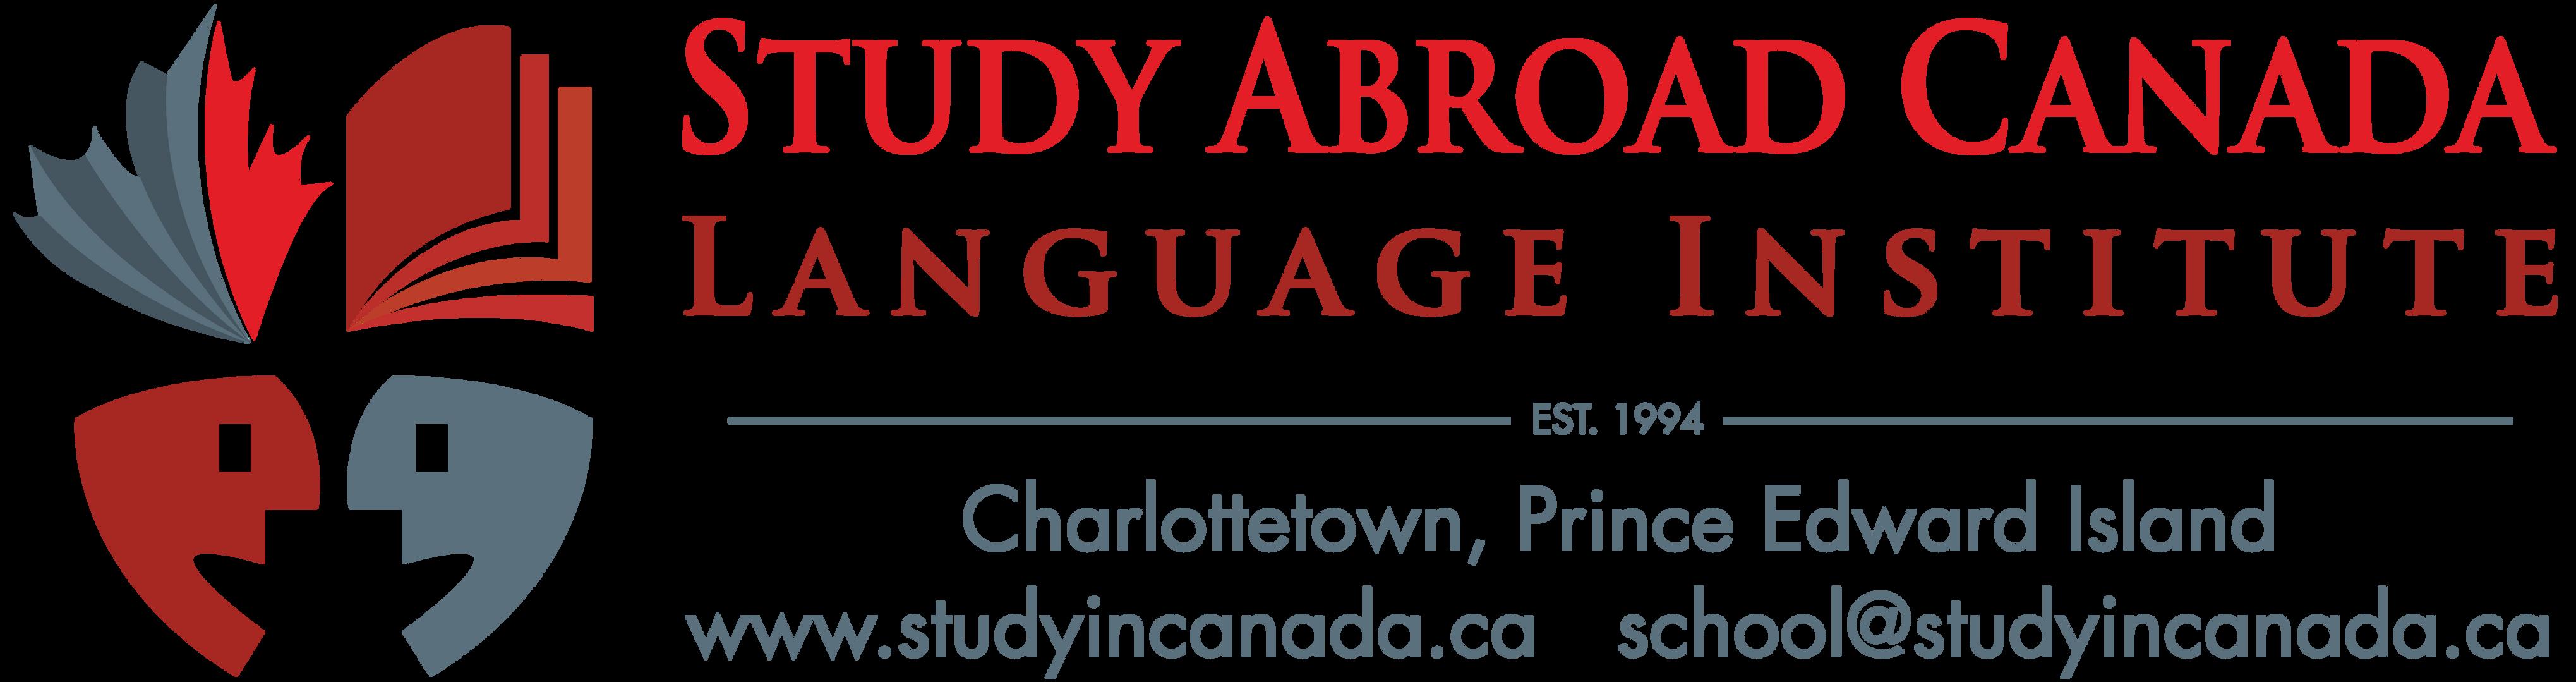 Hansa - English School in Canada 01.png